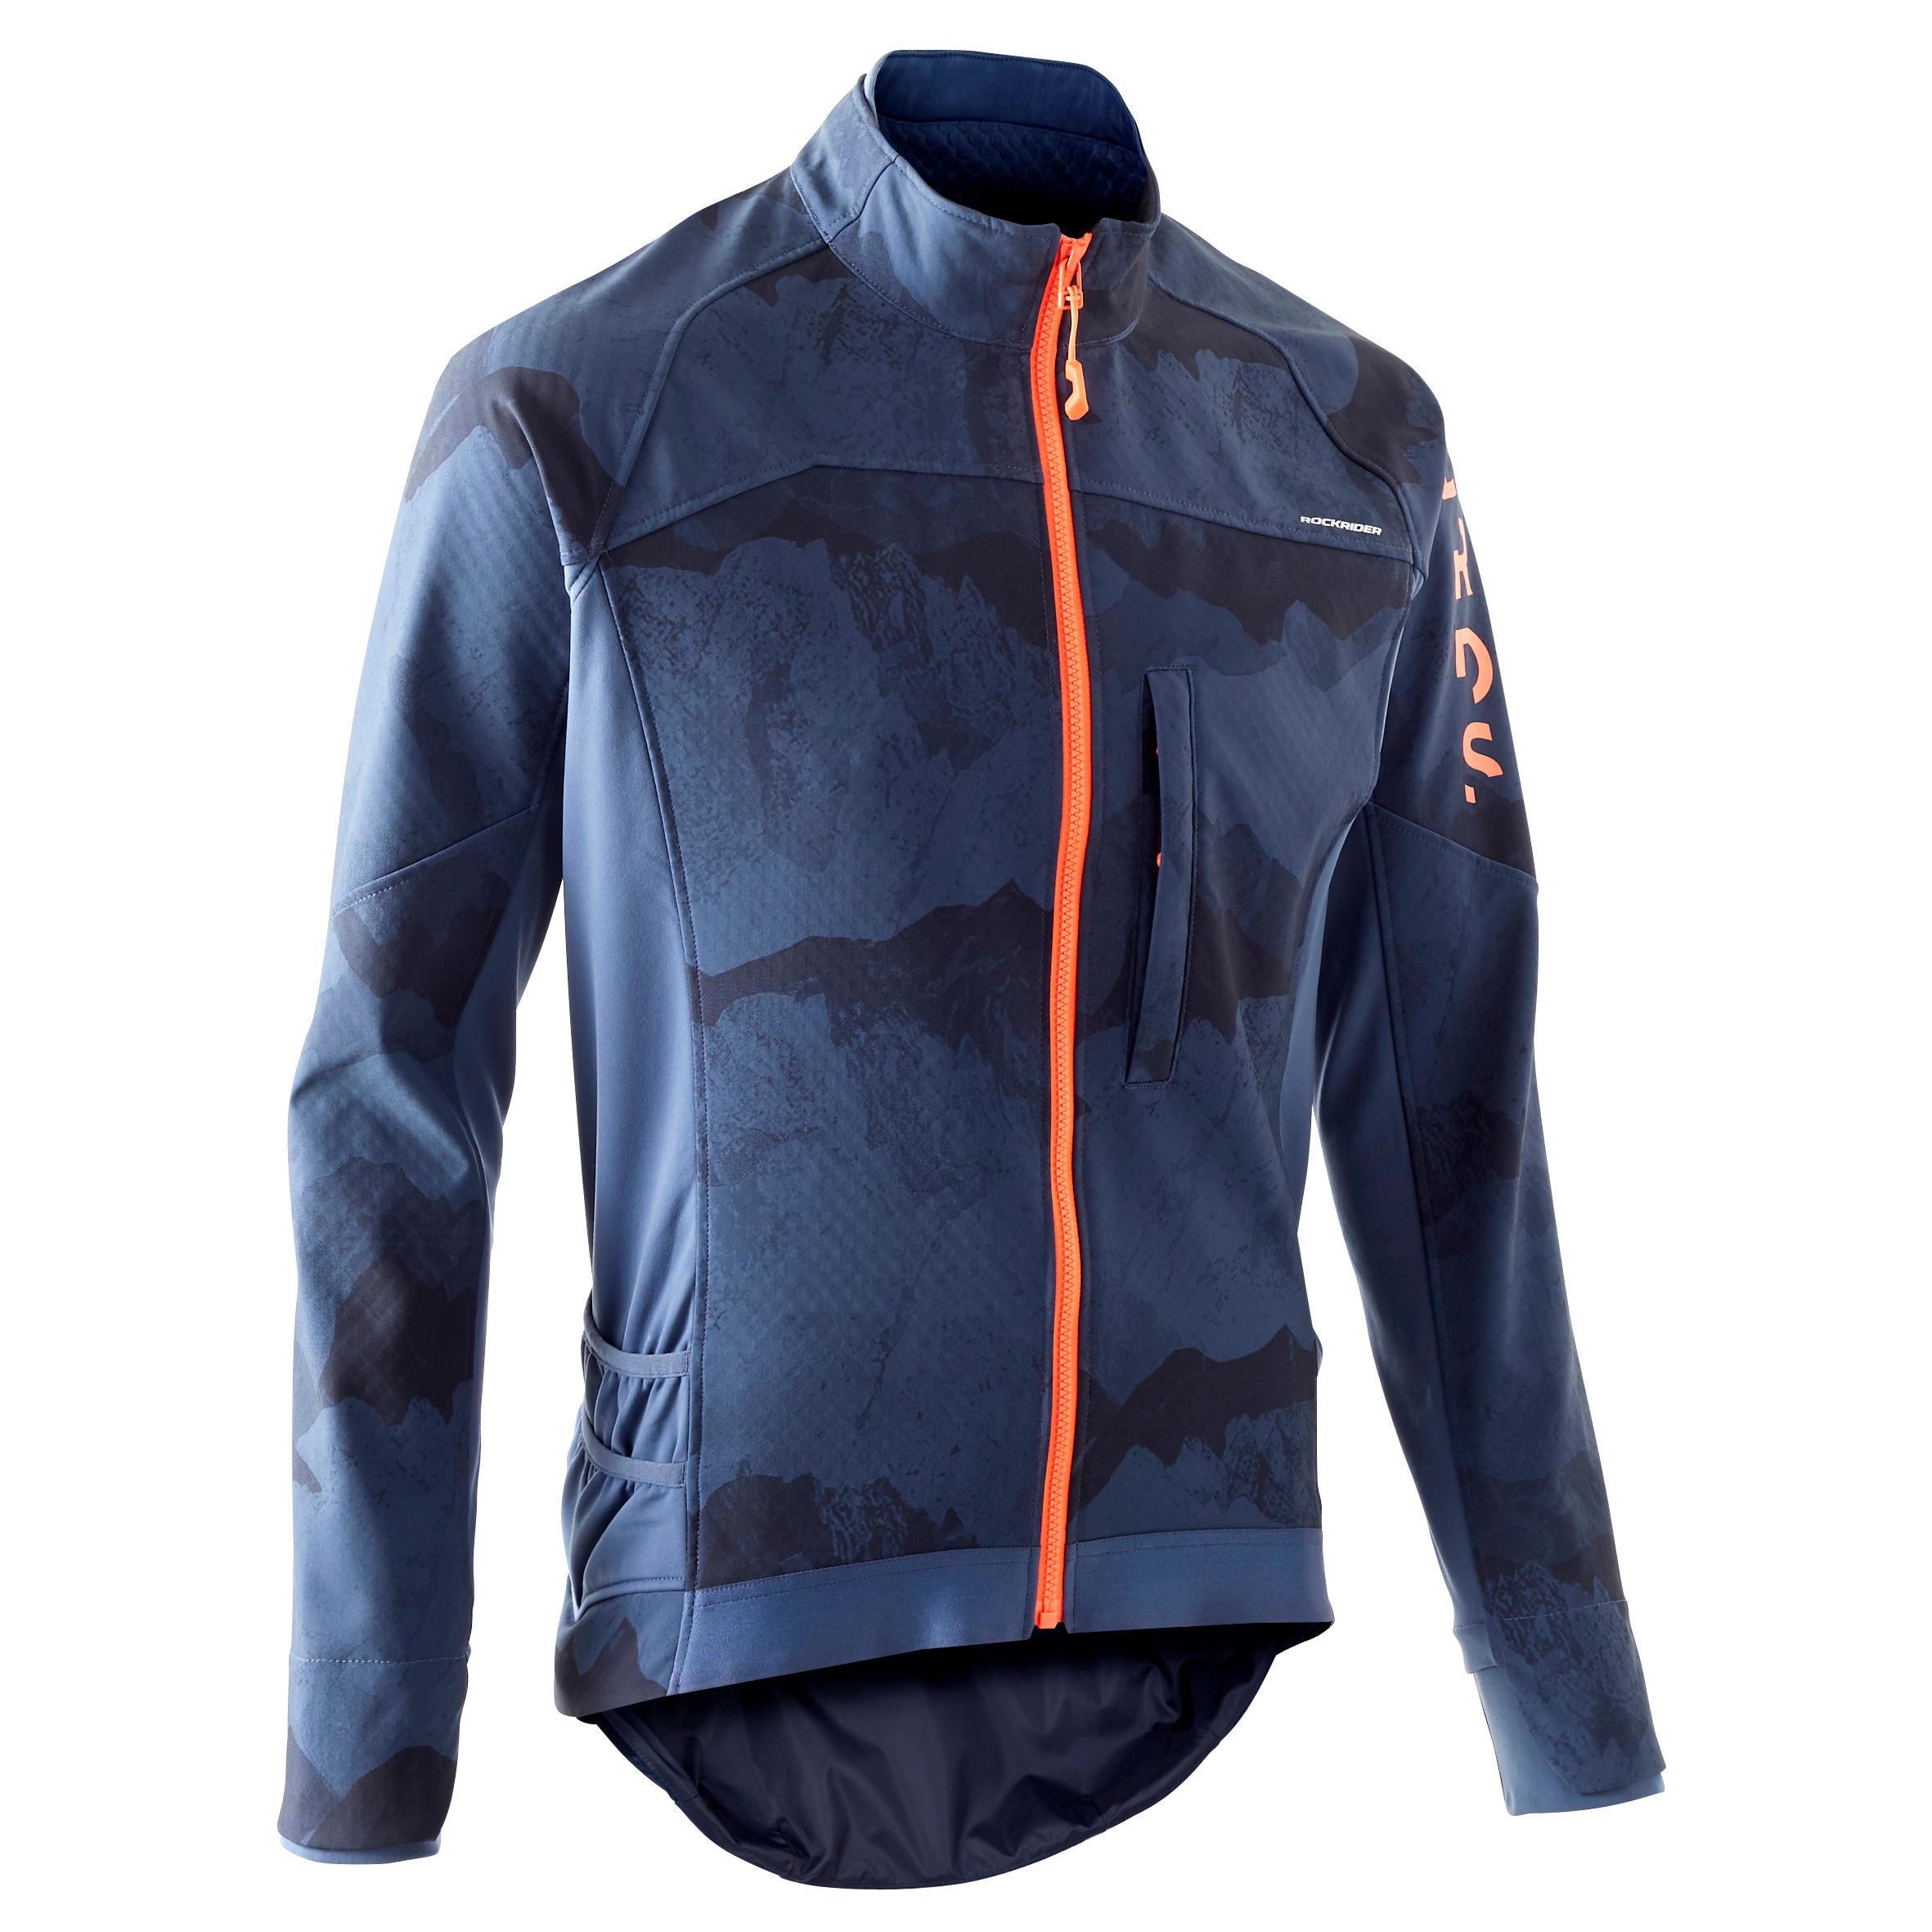 Jachetă MTB ST 500 Bărbați imagine